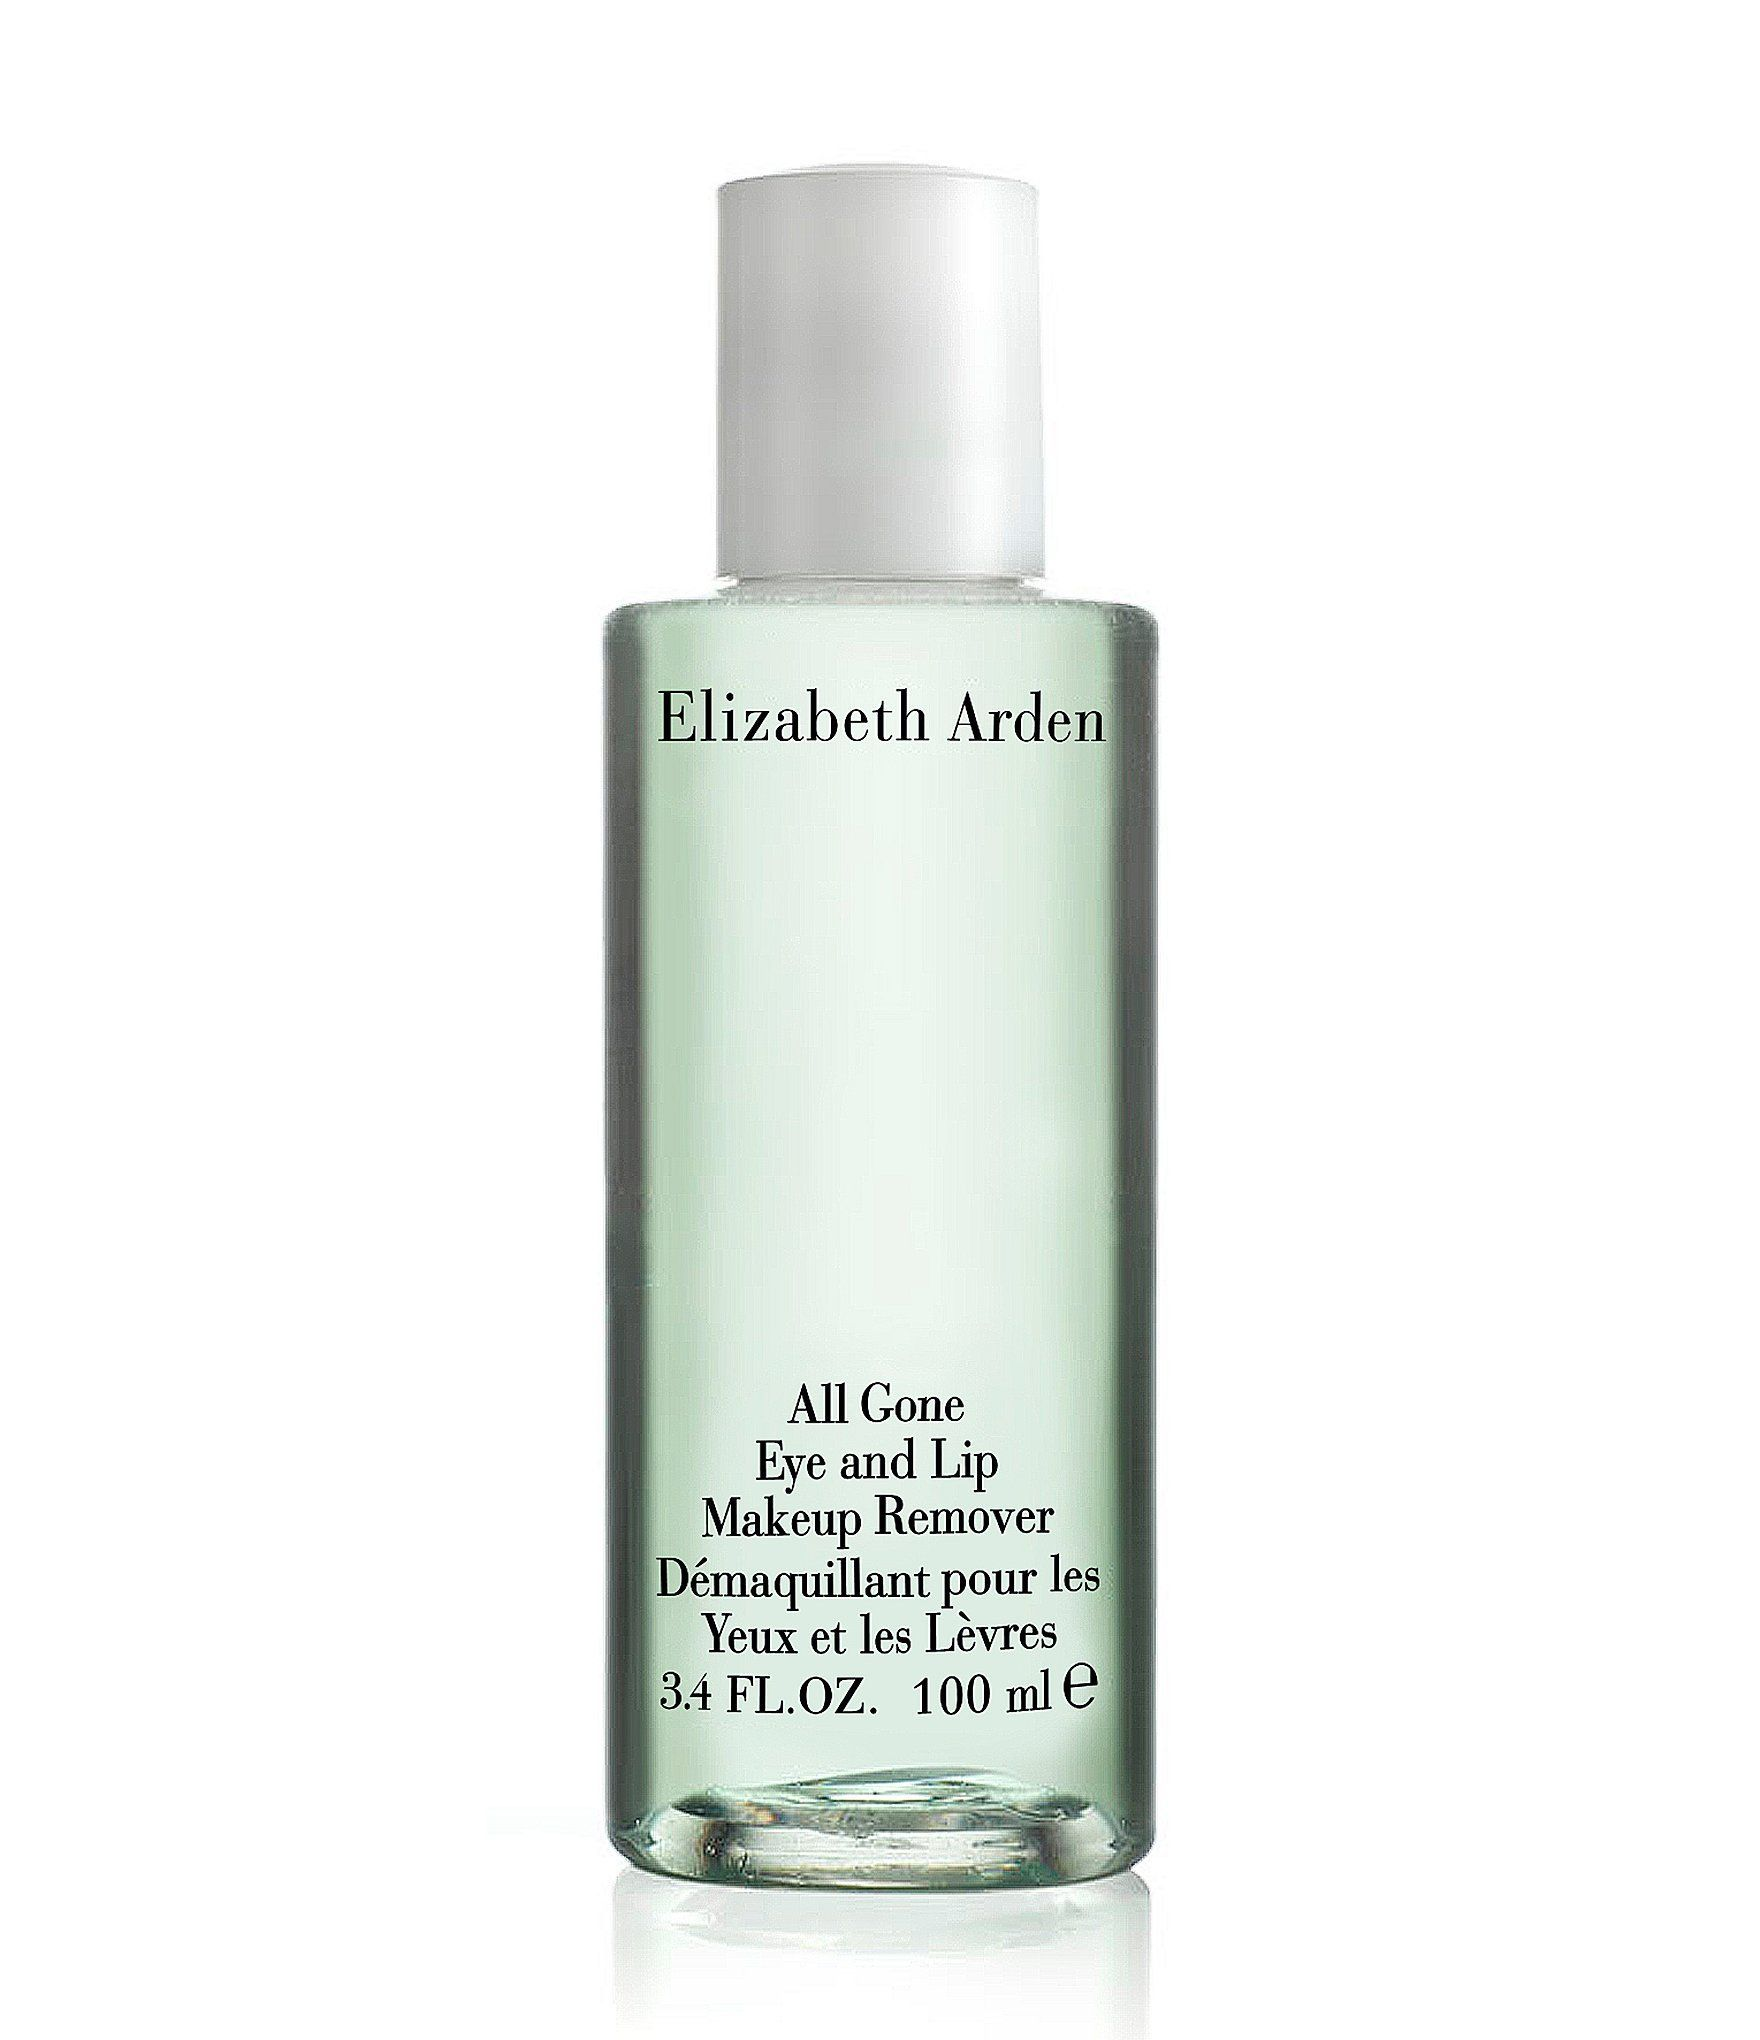 Elizabeth Arden All Gone Eye and Lip Makeup Remover in